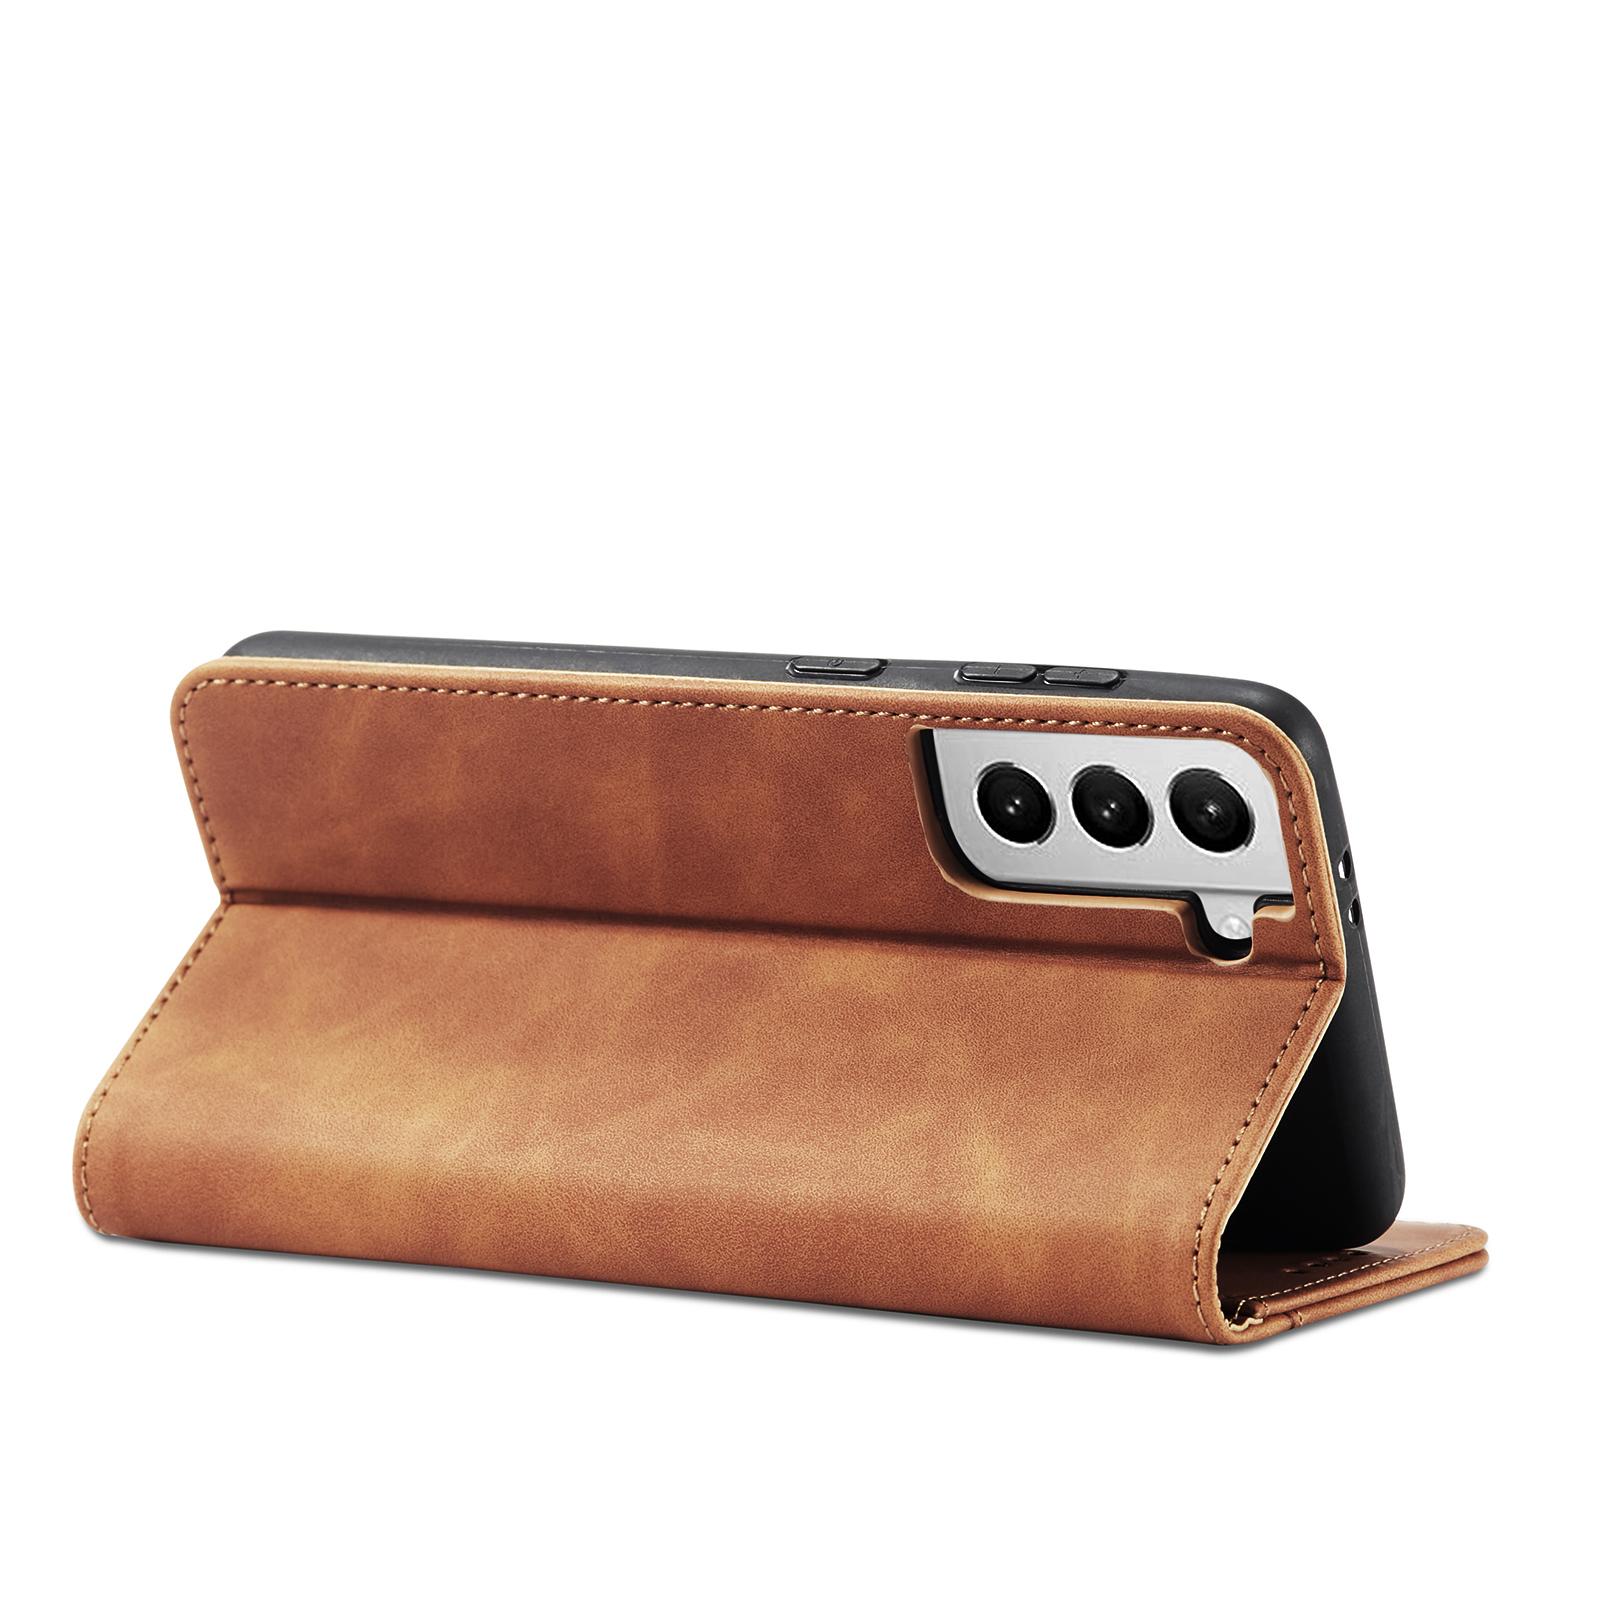 Mobile Phone Case For Samsung S30 Flip Phone Case Protective Case Cover Khaki